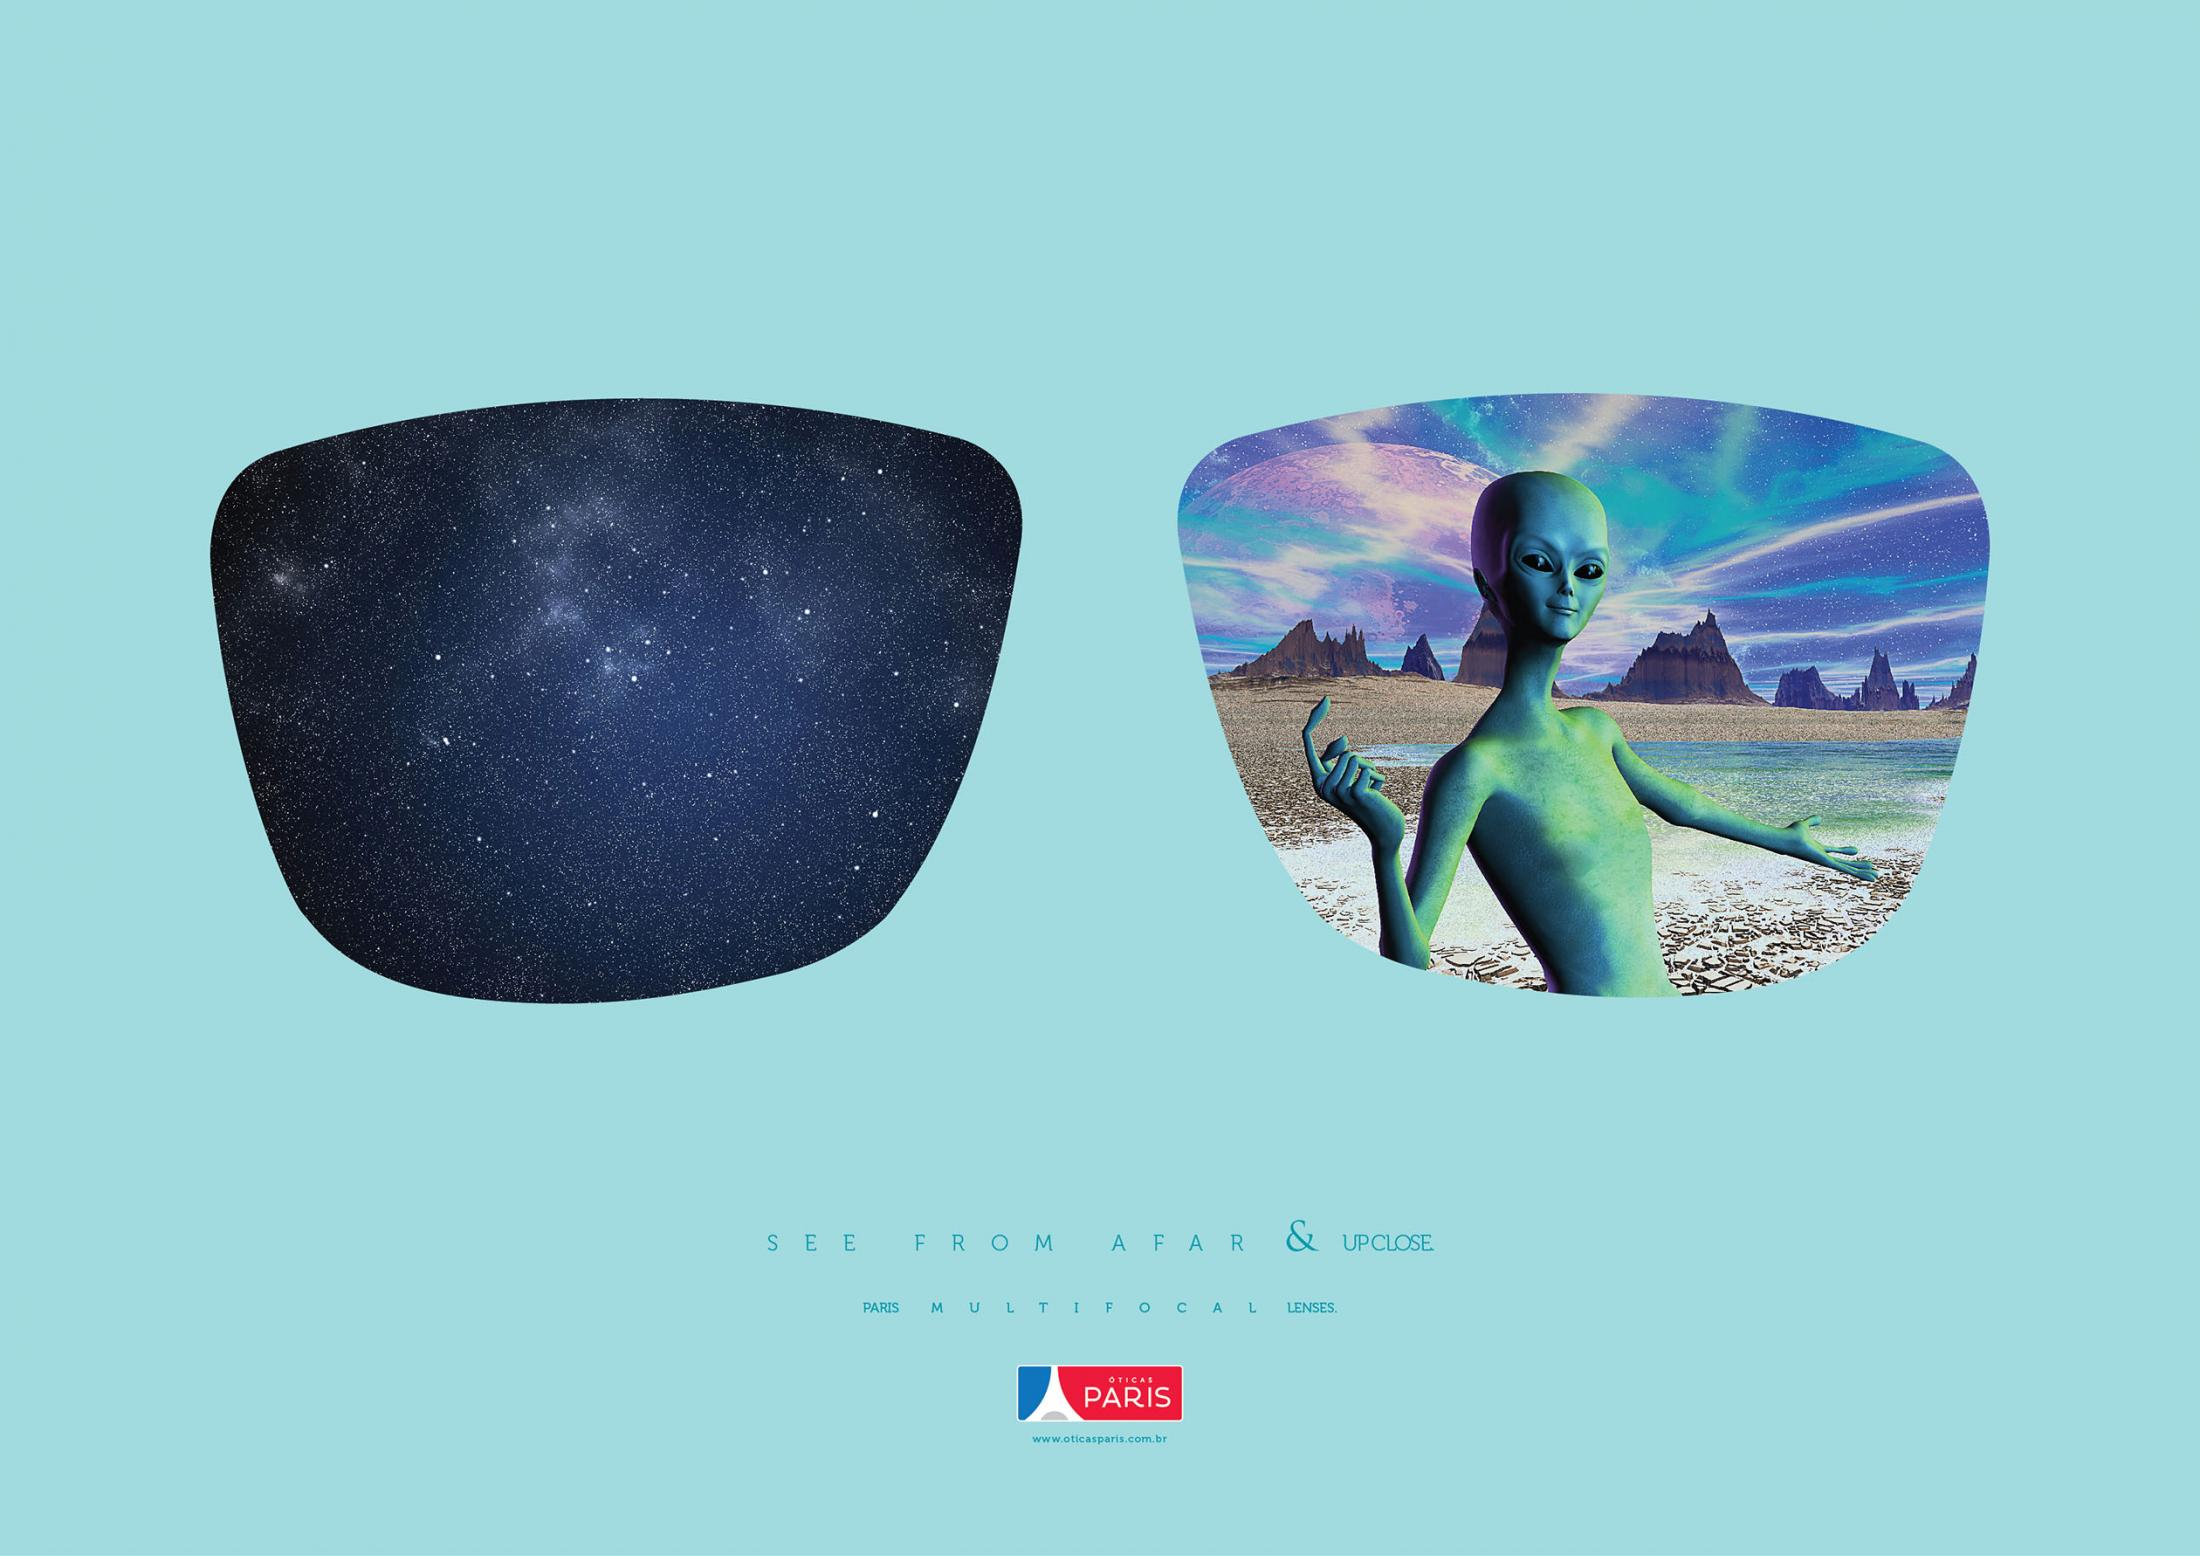 Óticas Paris Print Advert By MP Publicidade: Alien | Ads of the World™